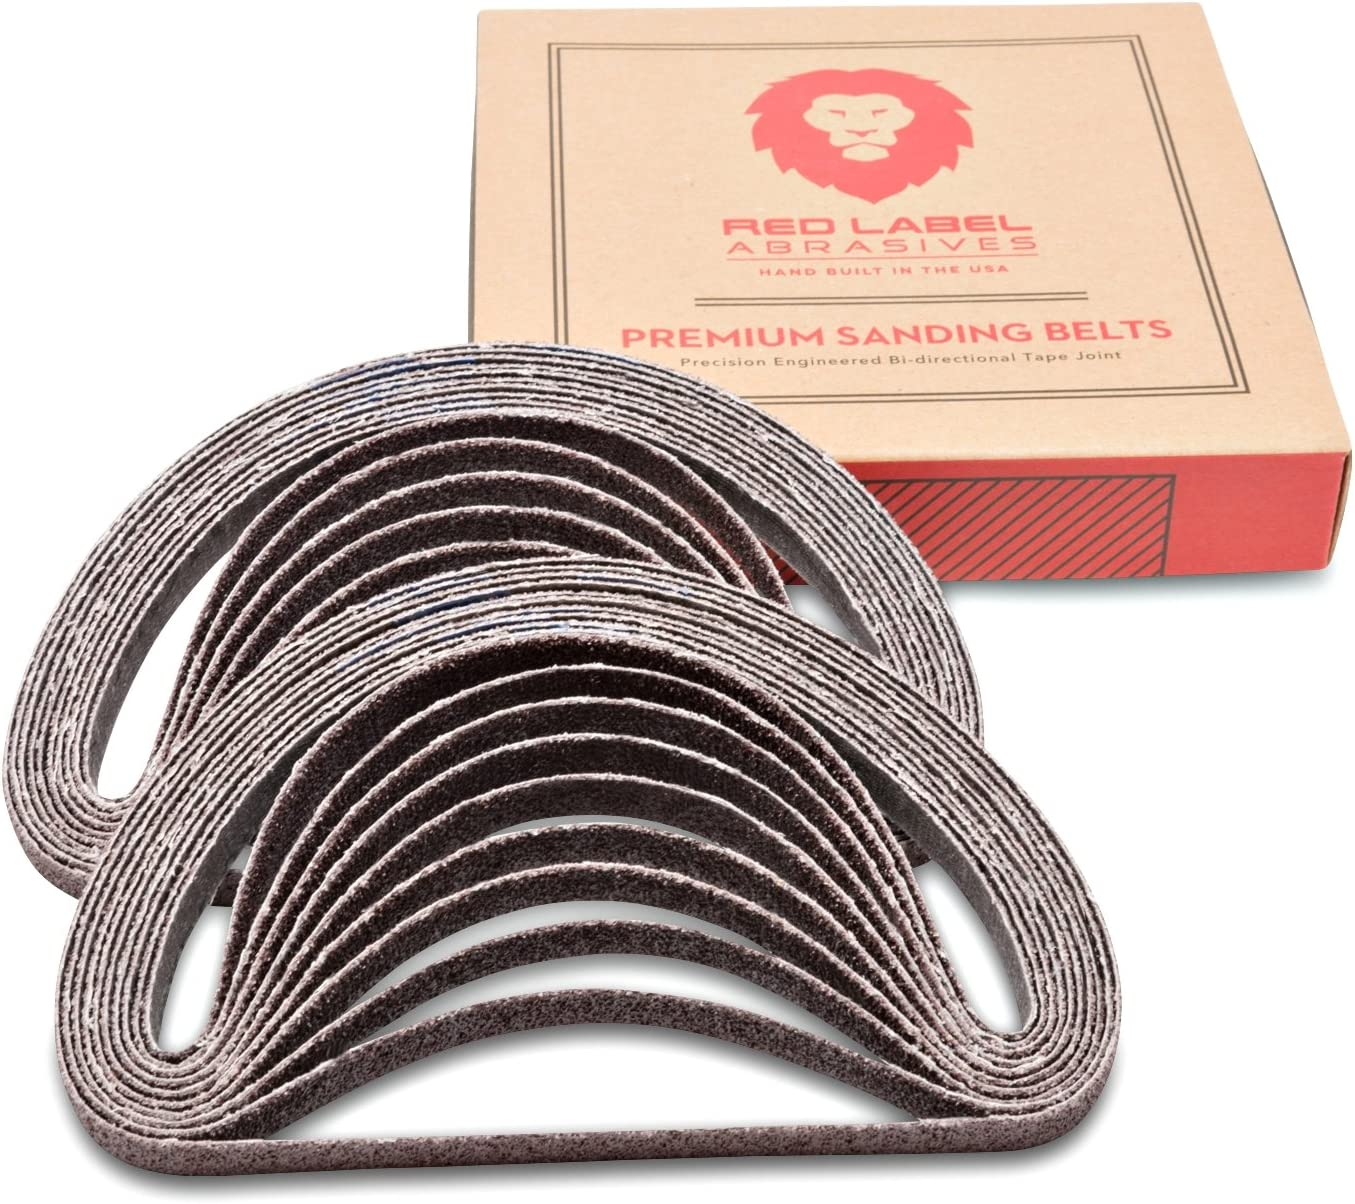 1/2 X 18 Inch 36 Grit Aluminum Oxide Air File Sanding Belts, 20 Pack